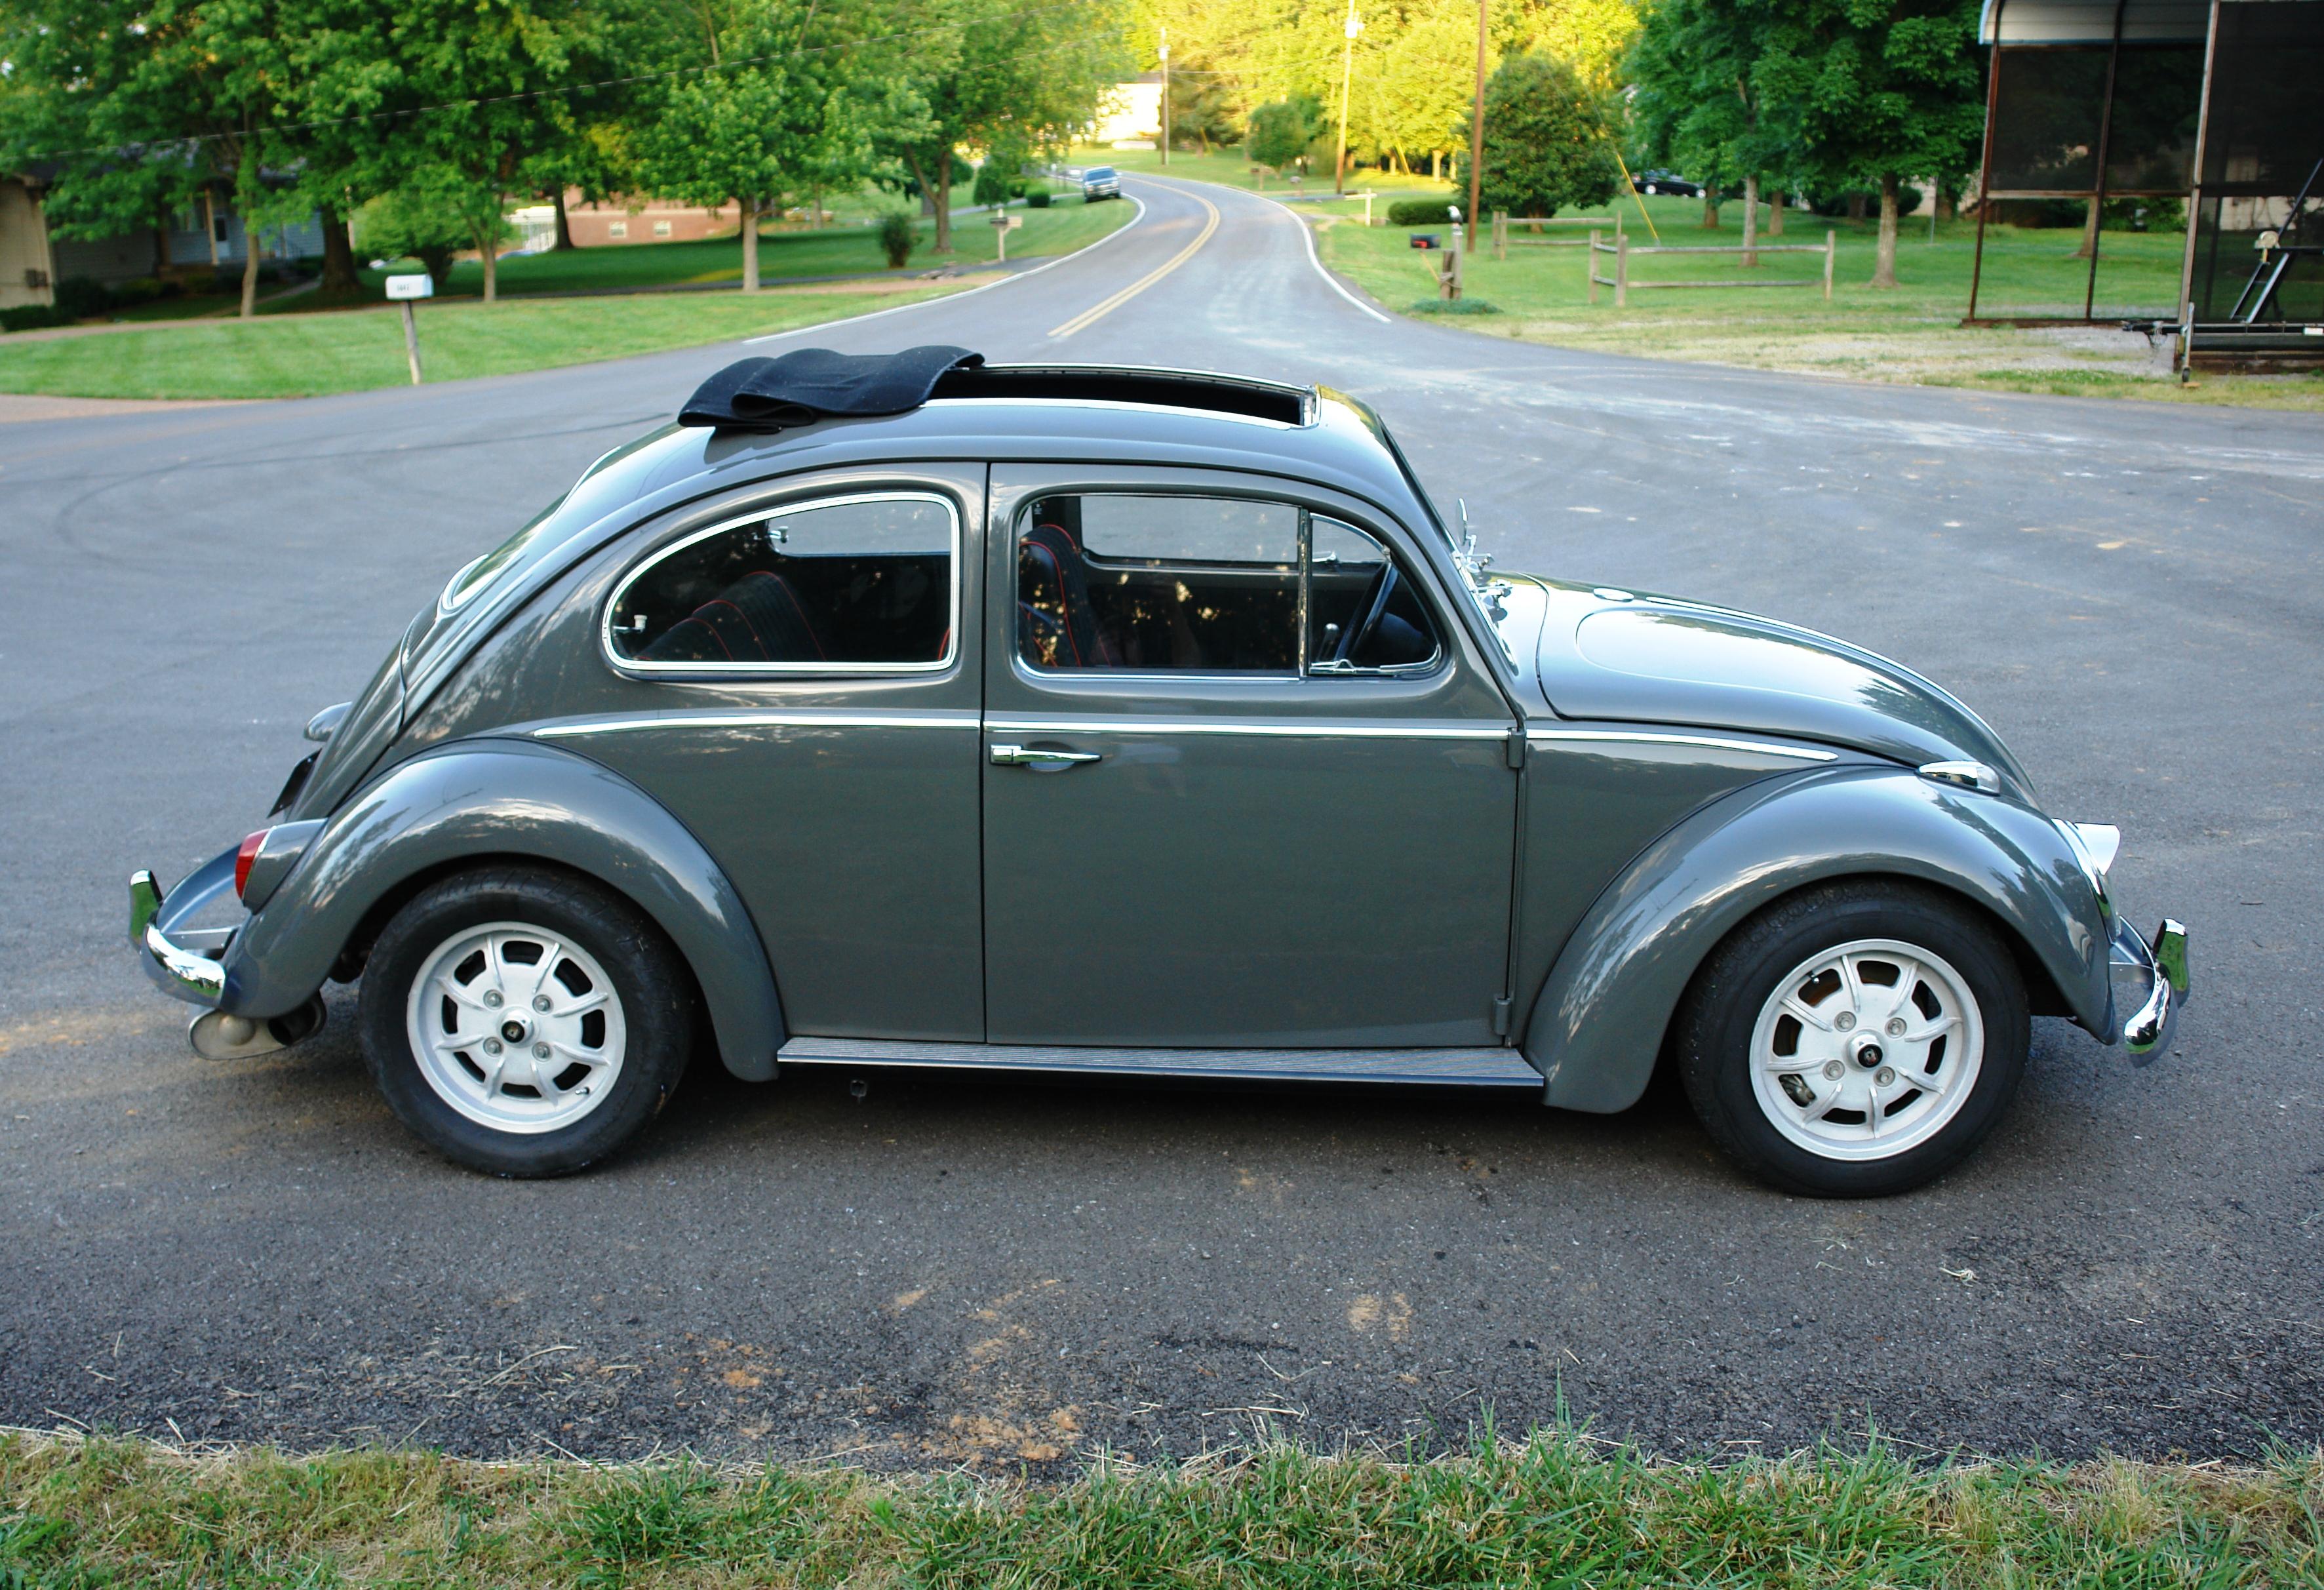 used crain volkswagen vehicles beetle new fayetteville craigslist of vw